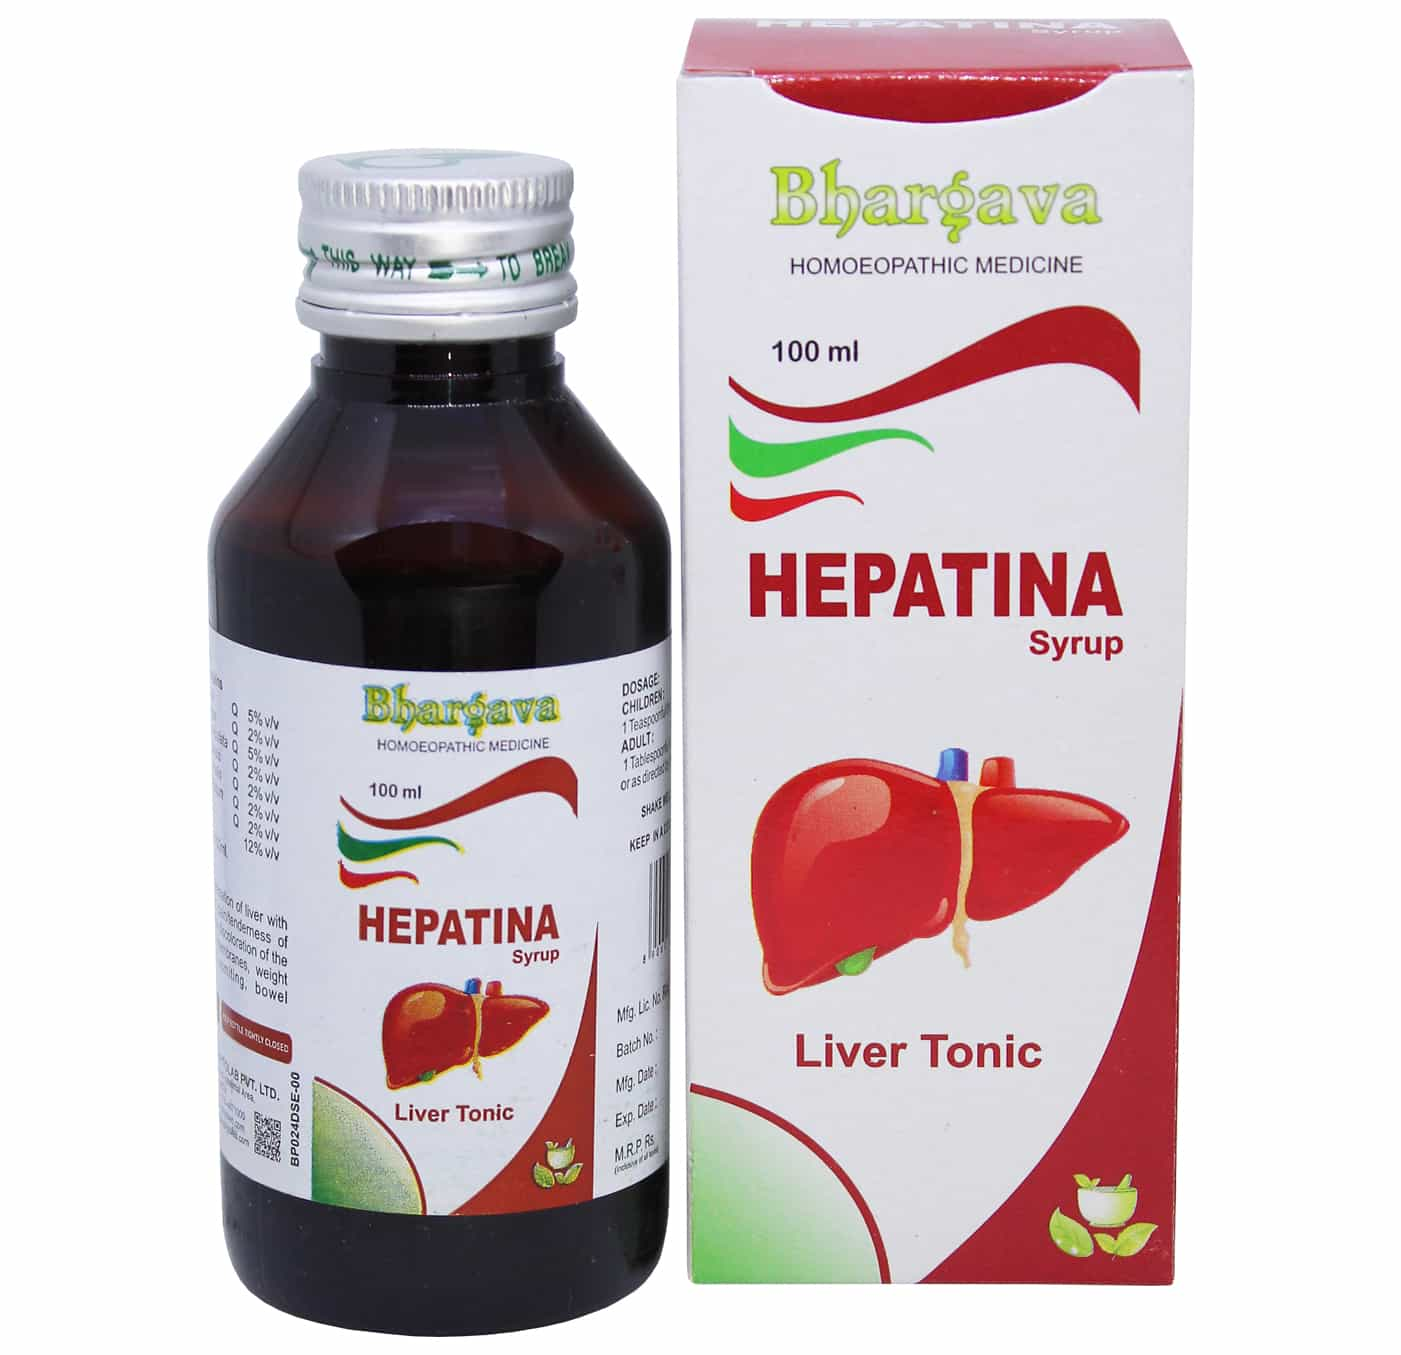 Hepatina Syrup style=